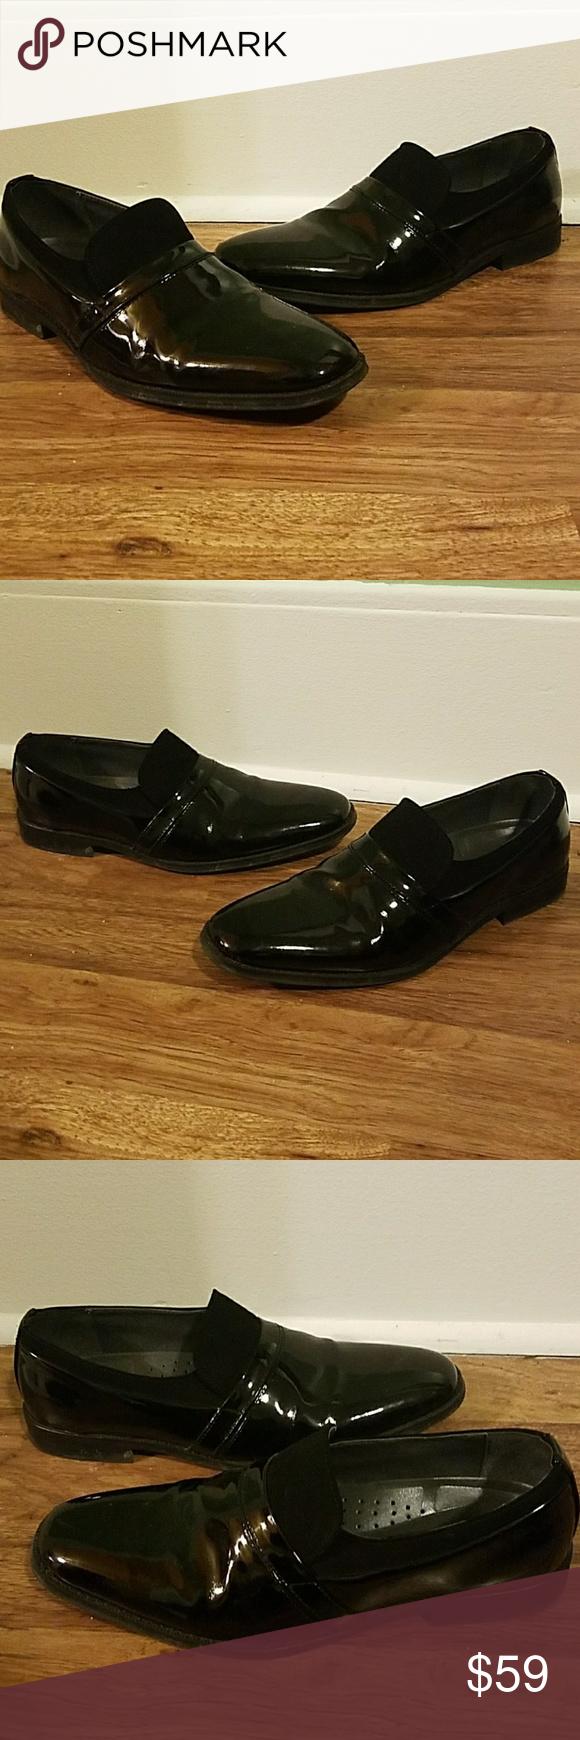 37366b6a7a658 Giorgio Brutini Black Patent Leather Tuxedo Shoes Giorgio Brutini Black  Patent Leather Tuxedo Shoes Size 10M Us Color Black Shiny Patent Leather.